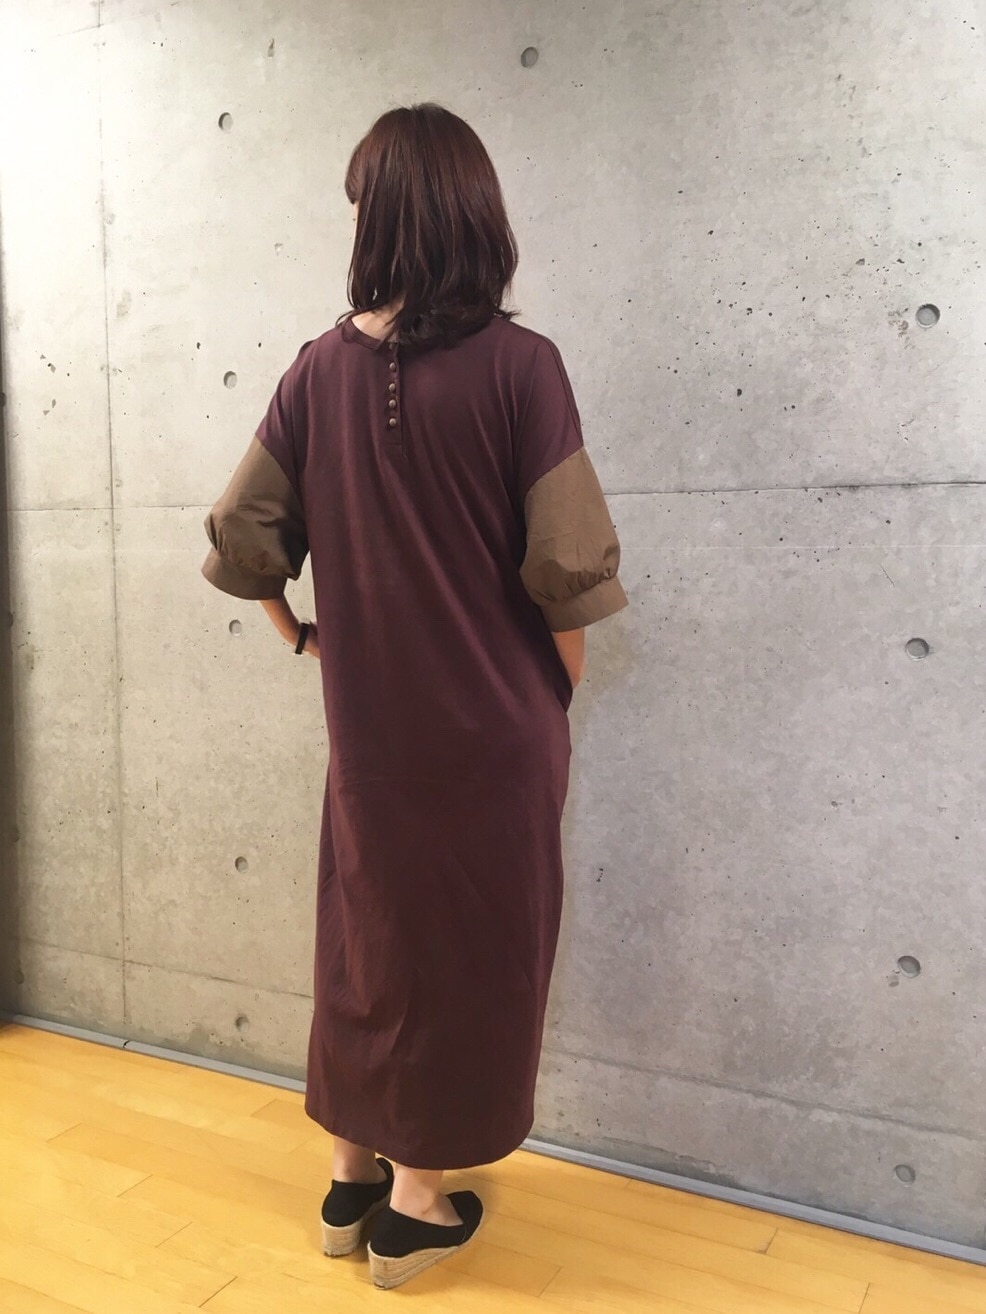 AMBIDEX アトリエ 身長:154cm 2019.07.11